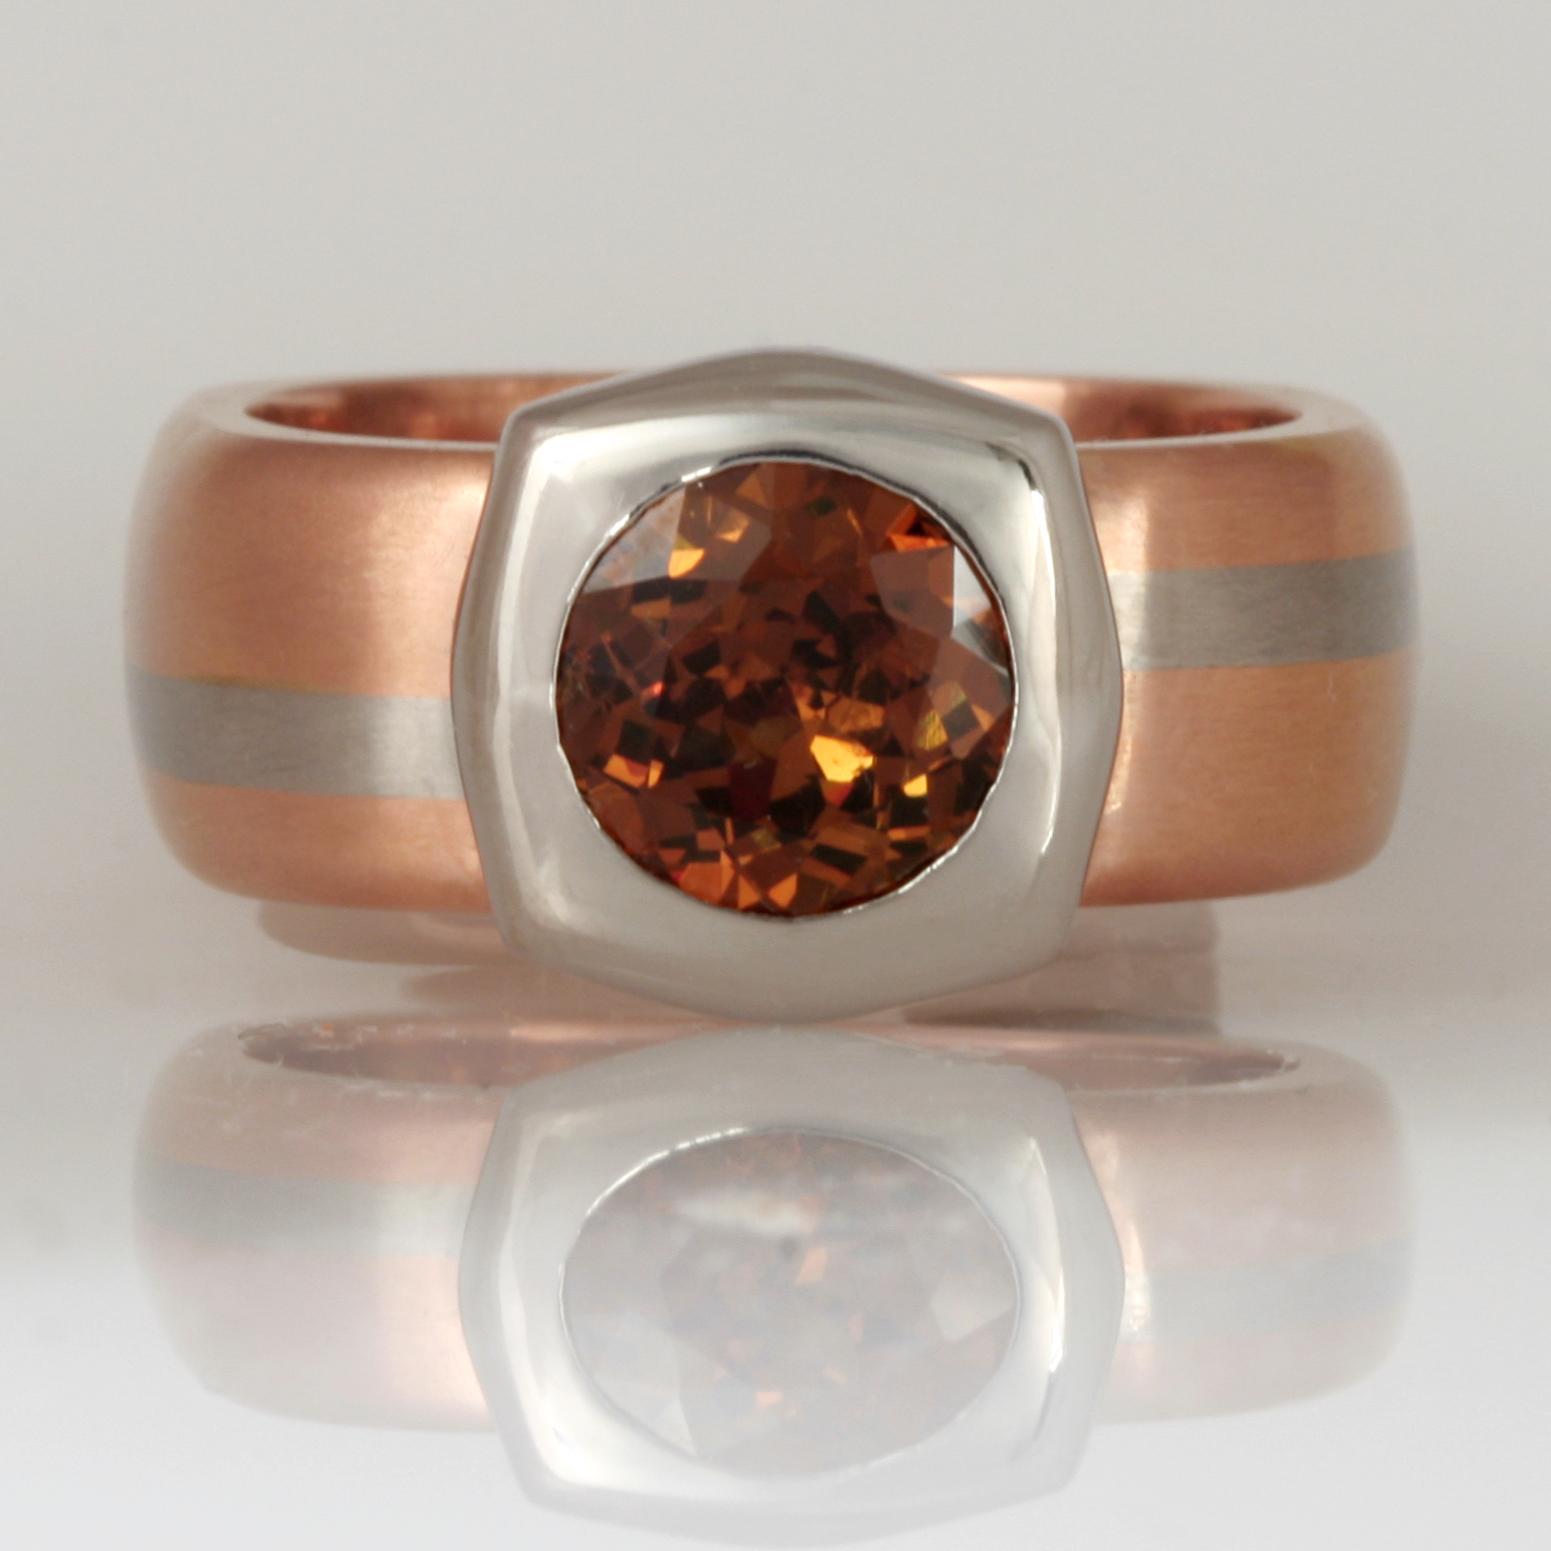 Handmade ladies palladium and 18ct rose gold ring featuring a demantoid garnet